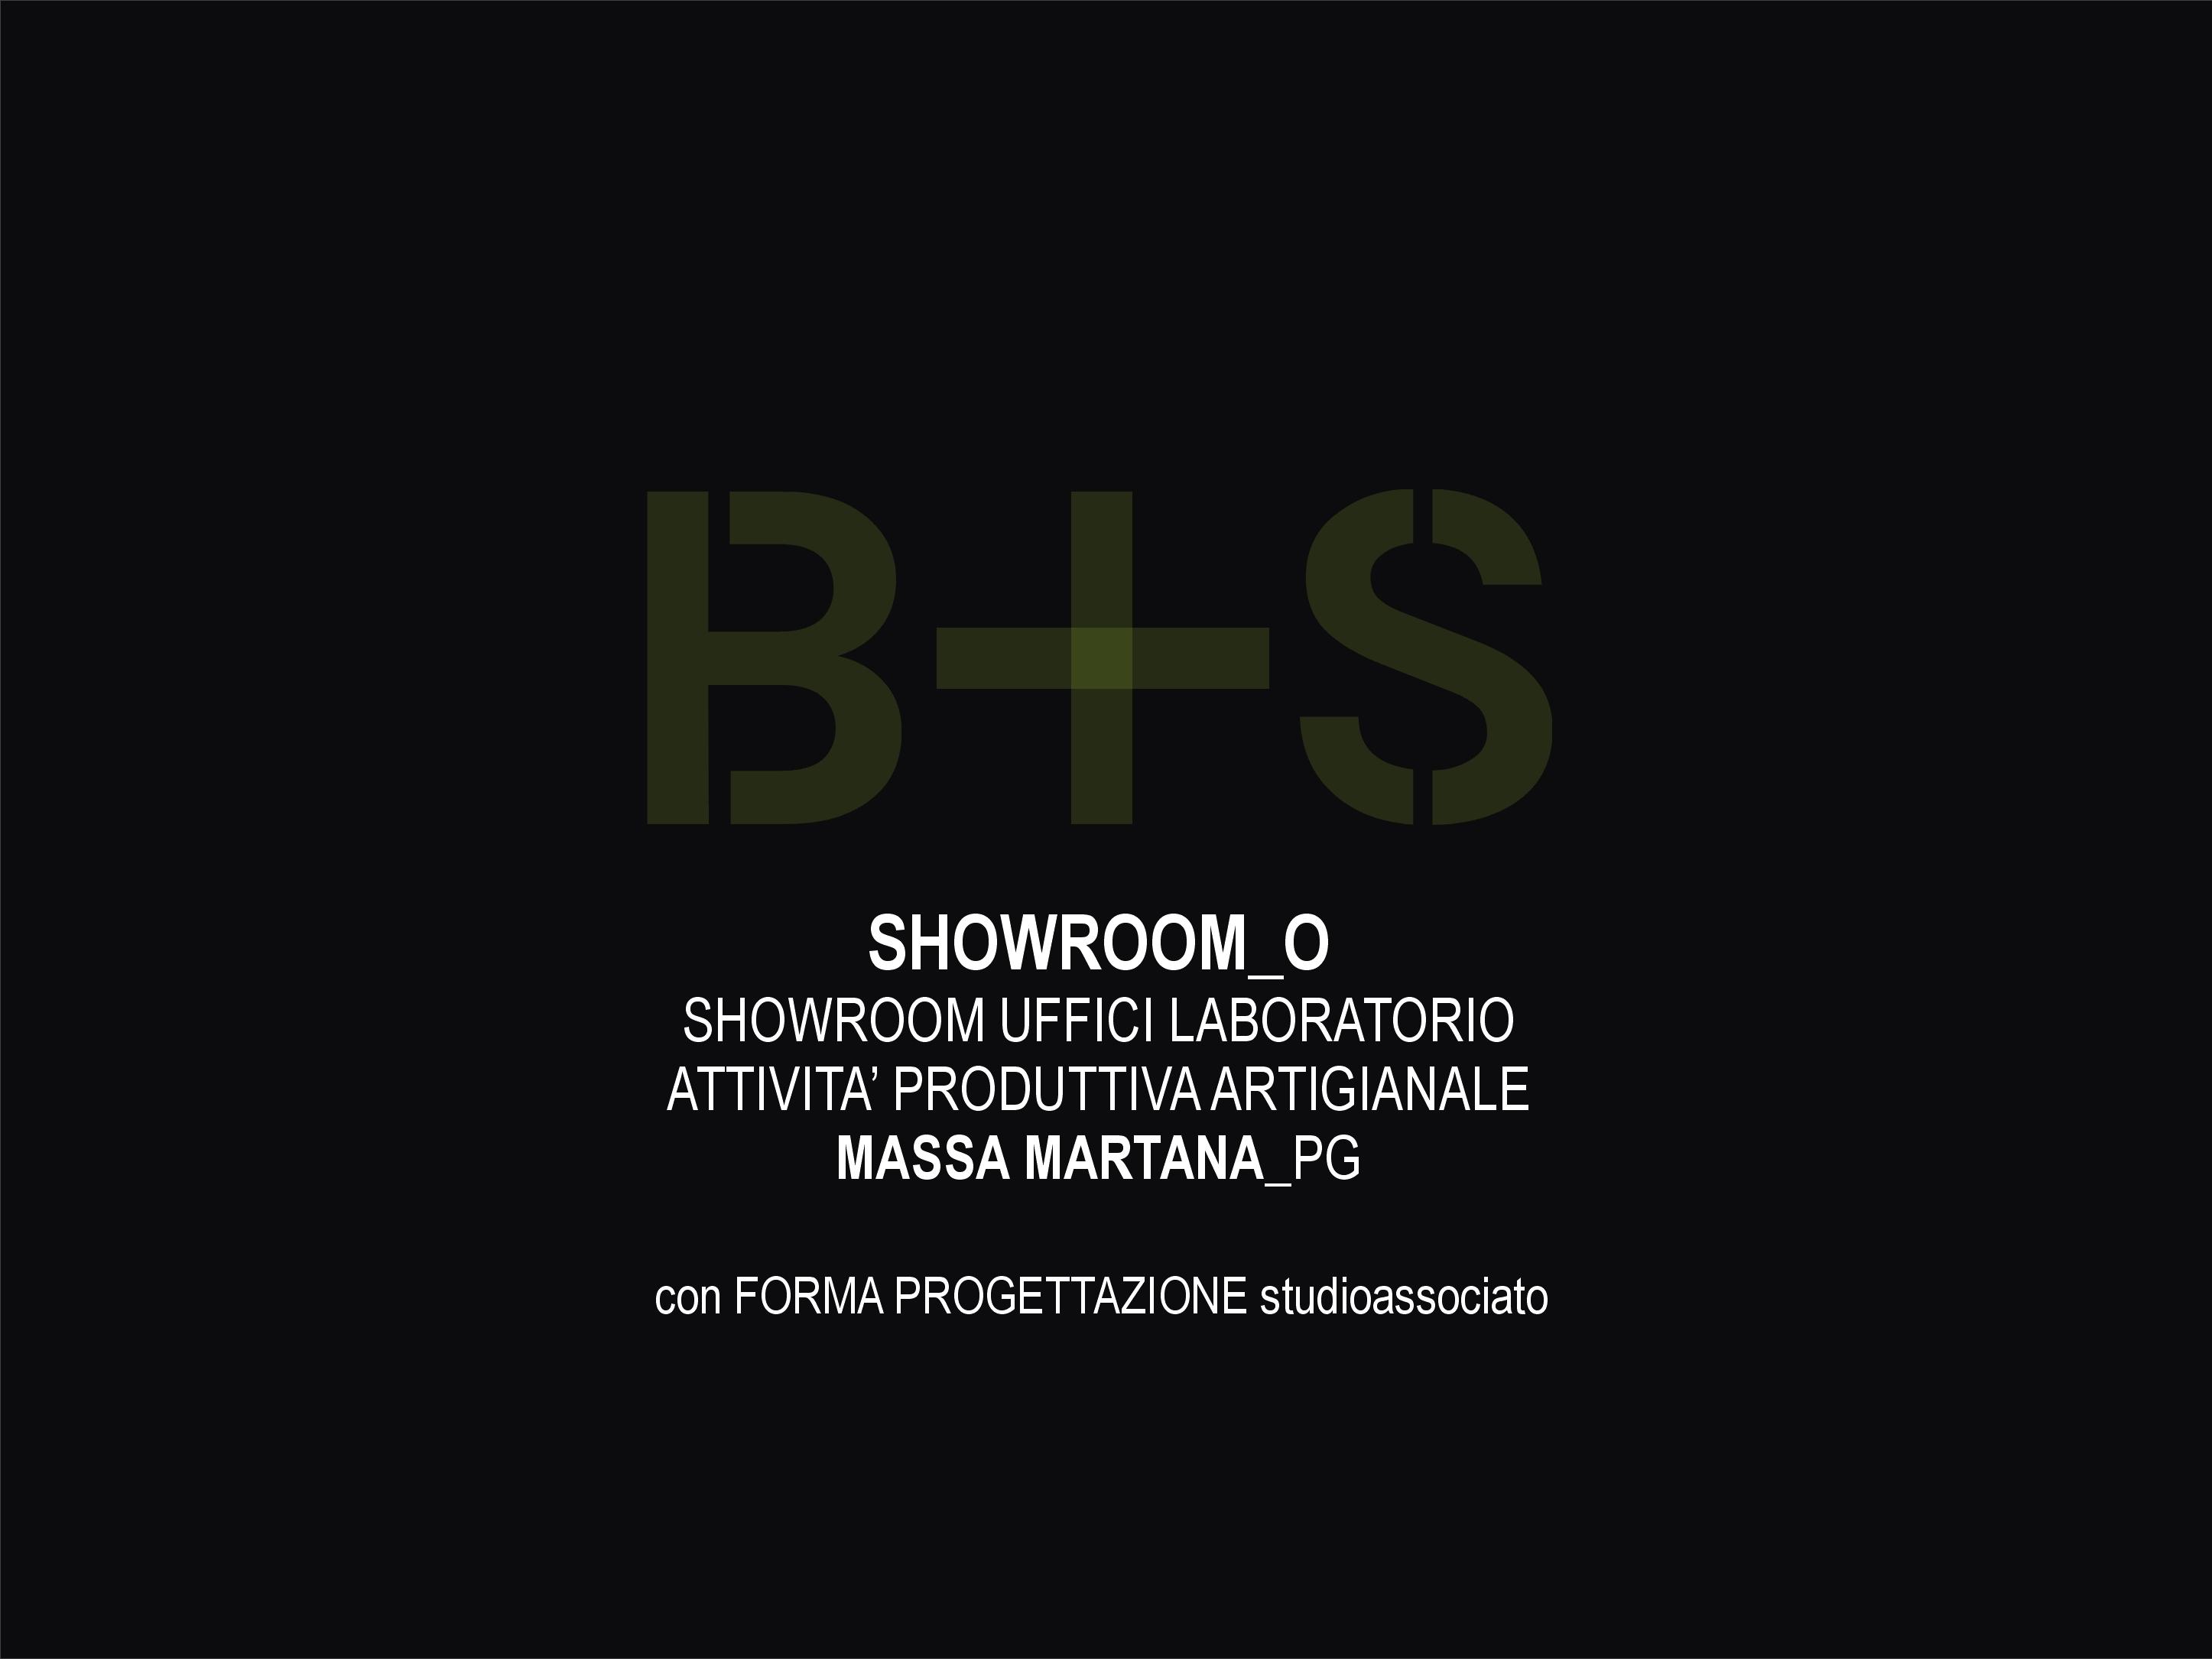 SHOWROOM_O